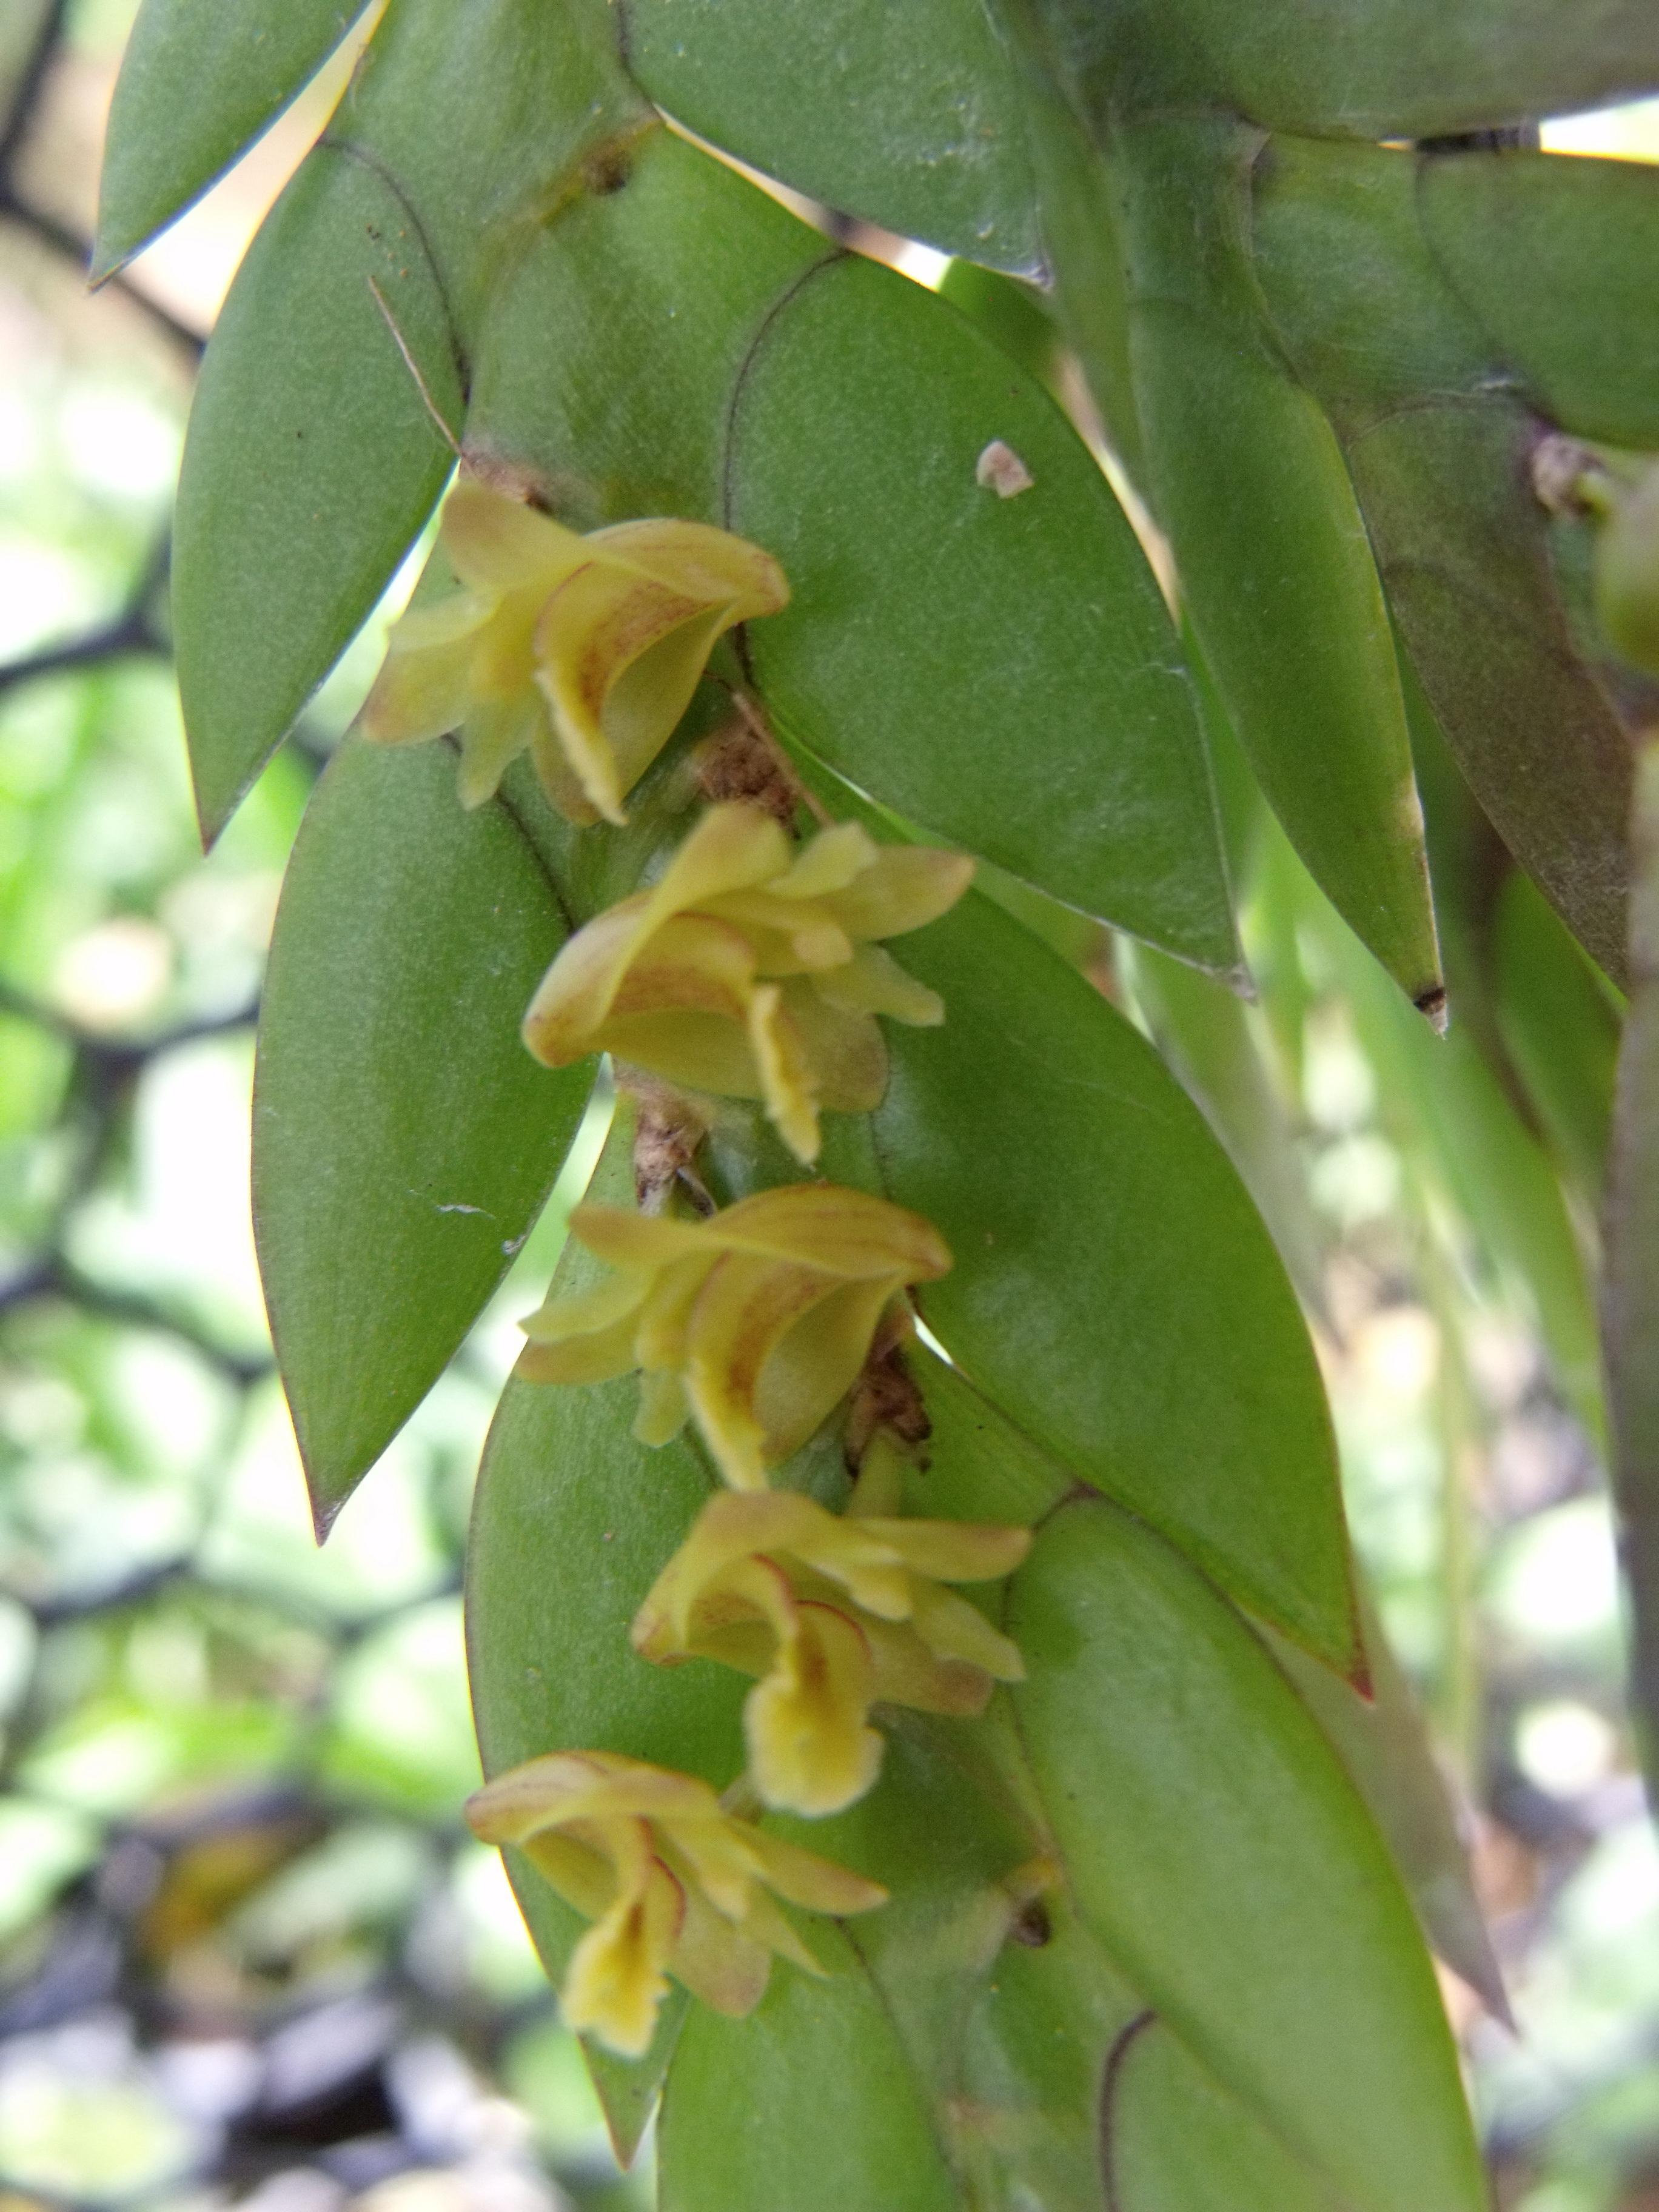 http://www.pflanzenfreunde.com/orchideenalbum/dendrobium-keithii.jpg